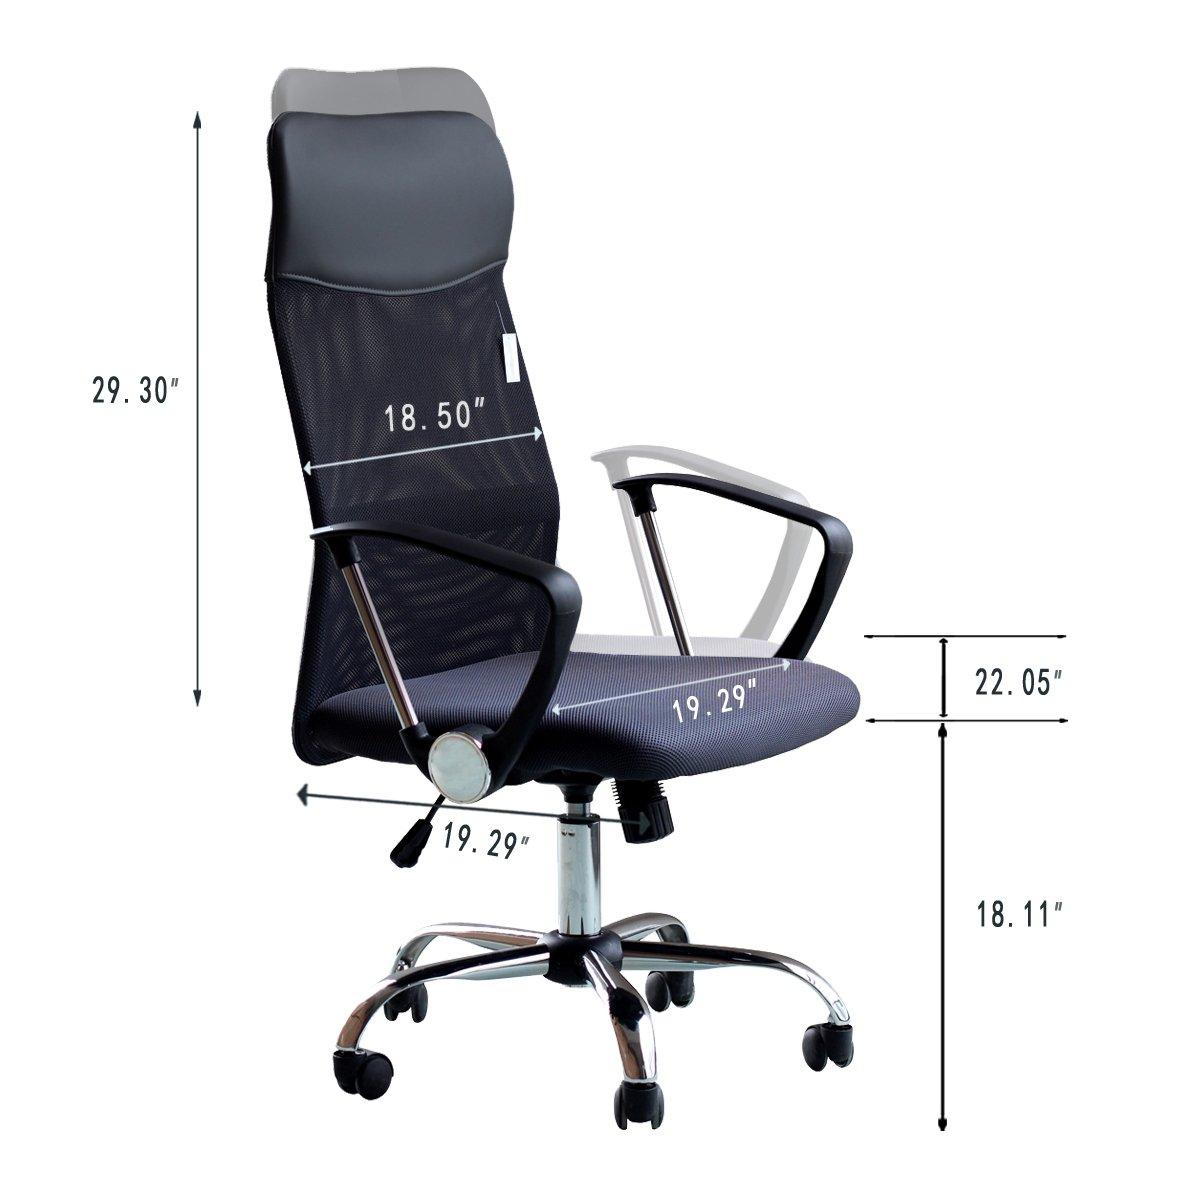 Bürostuhl ergonomisch höhenverstellbar  Bürostuhl Drehstuhl Chefsessel Computertischstuhl ...